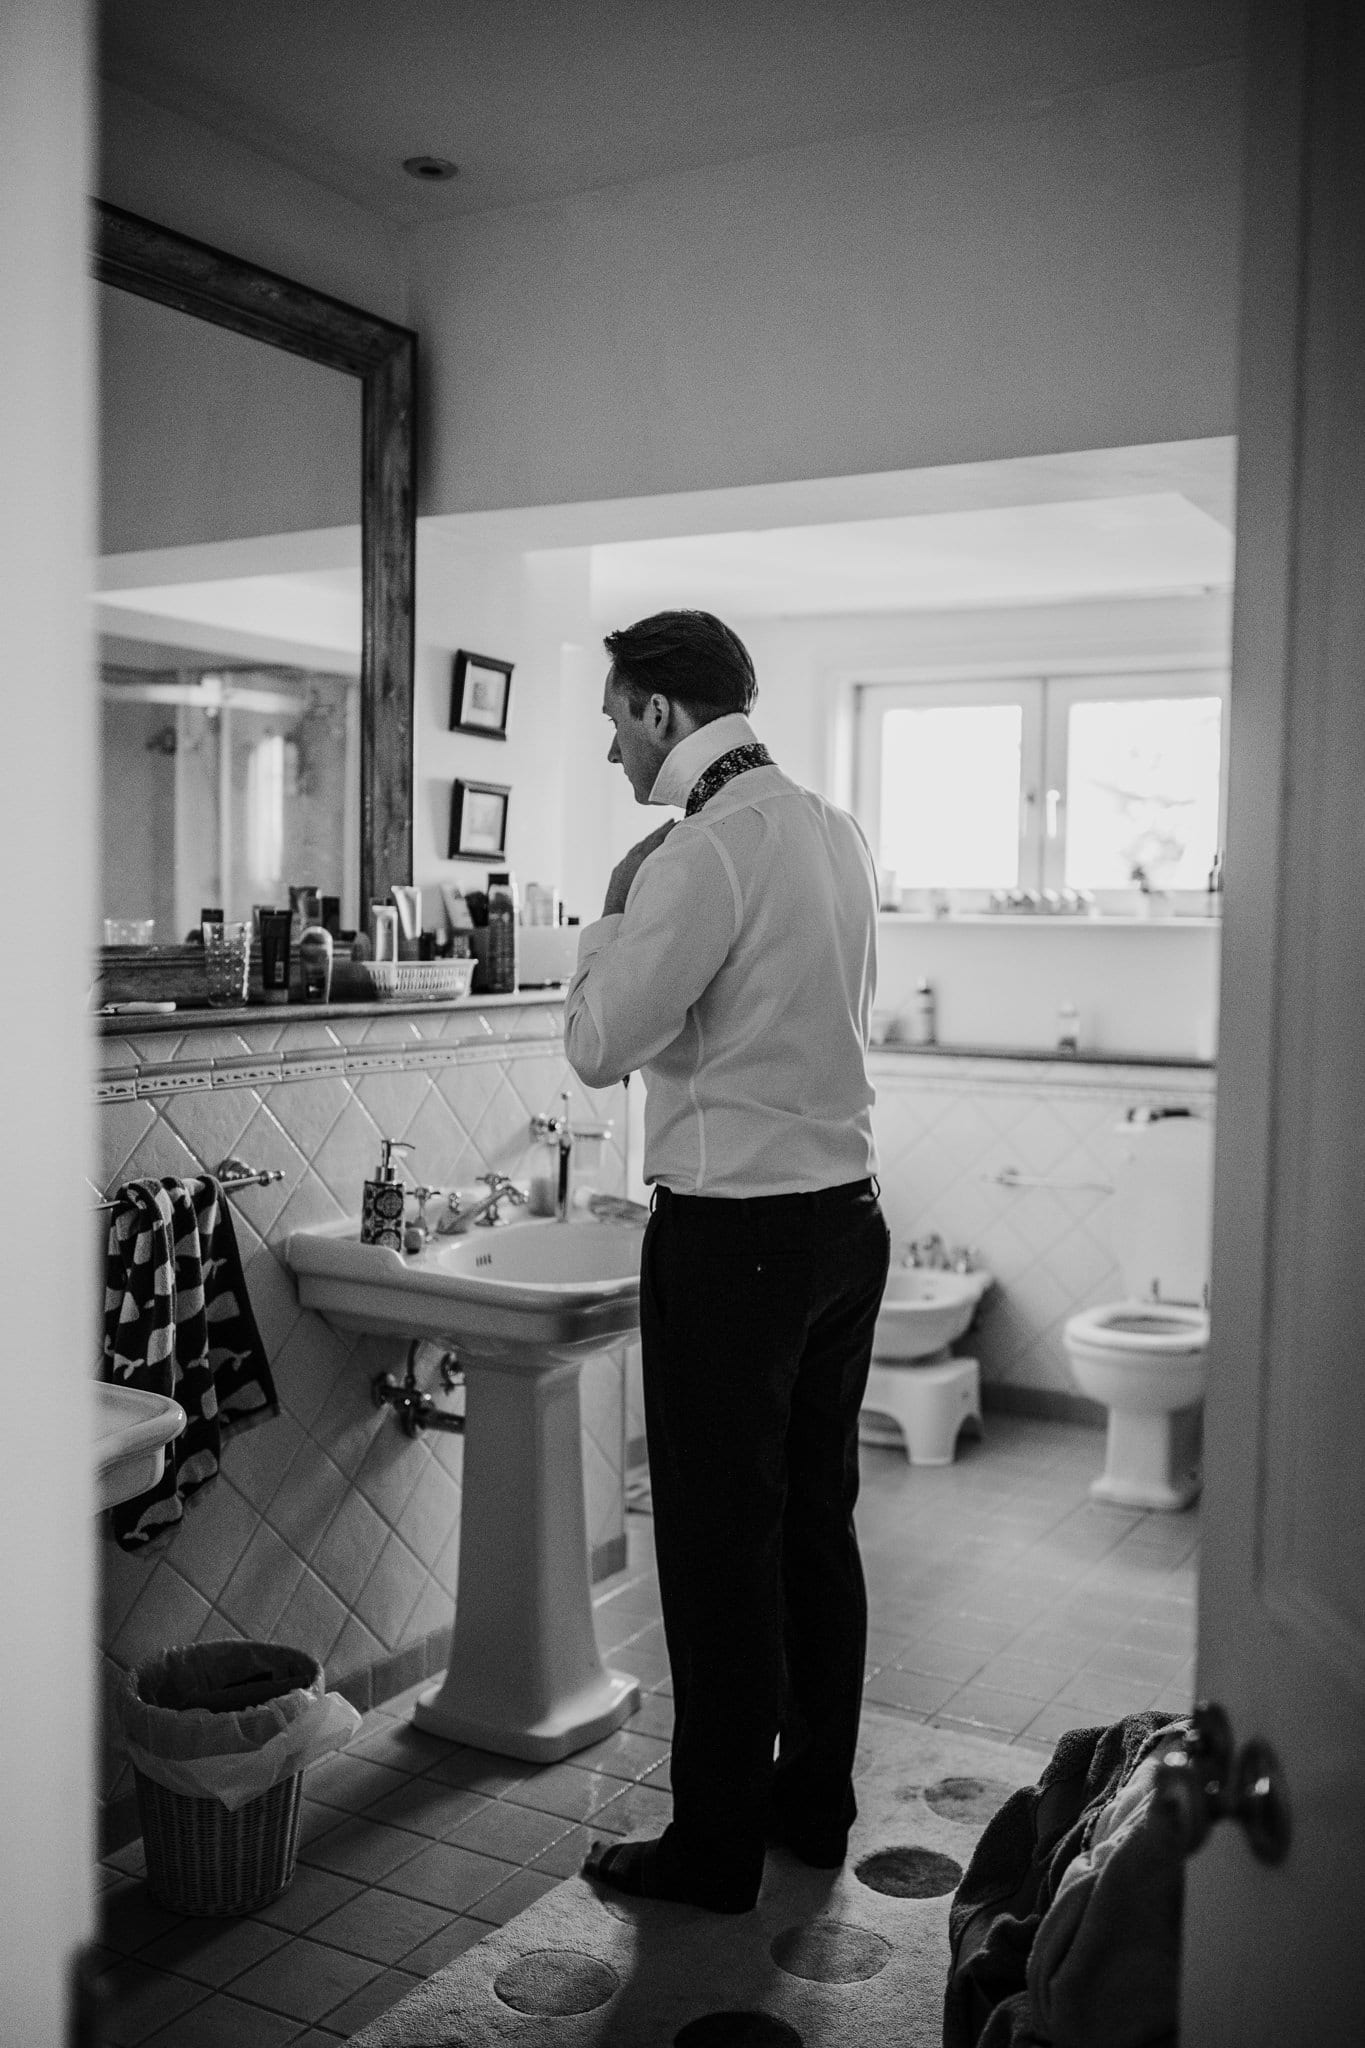 man adjusting his tie in the bathroom